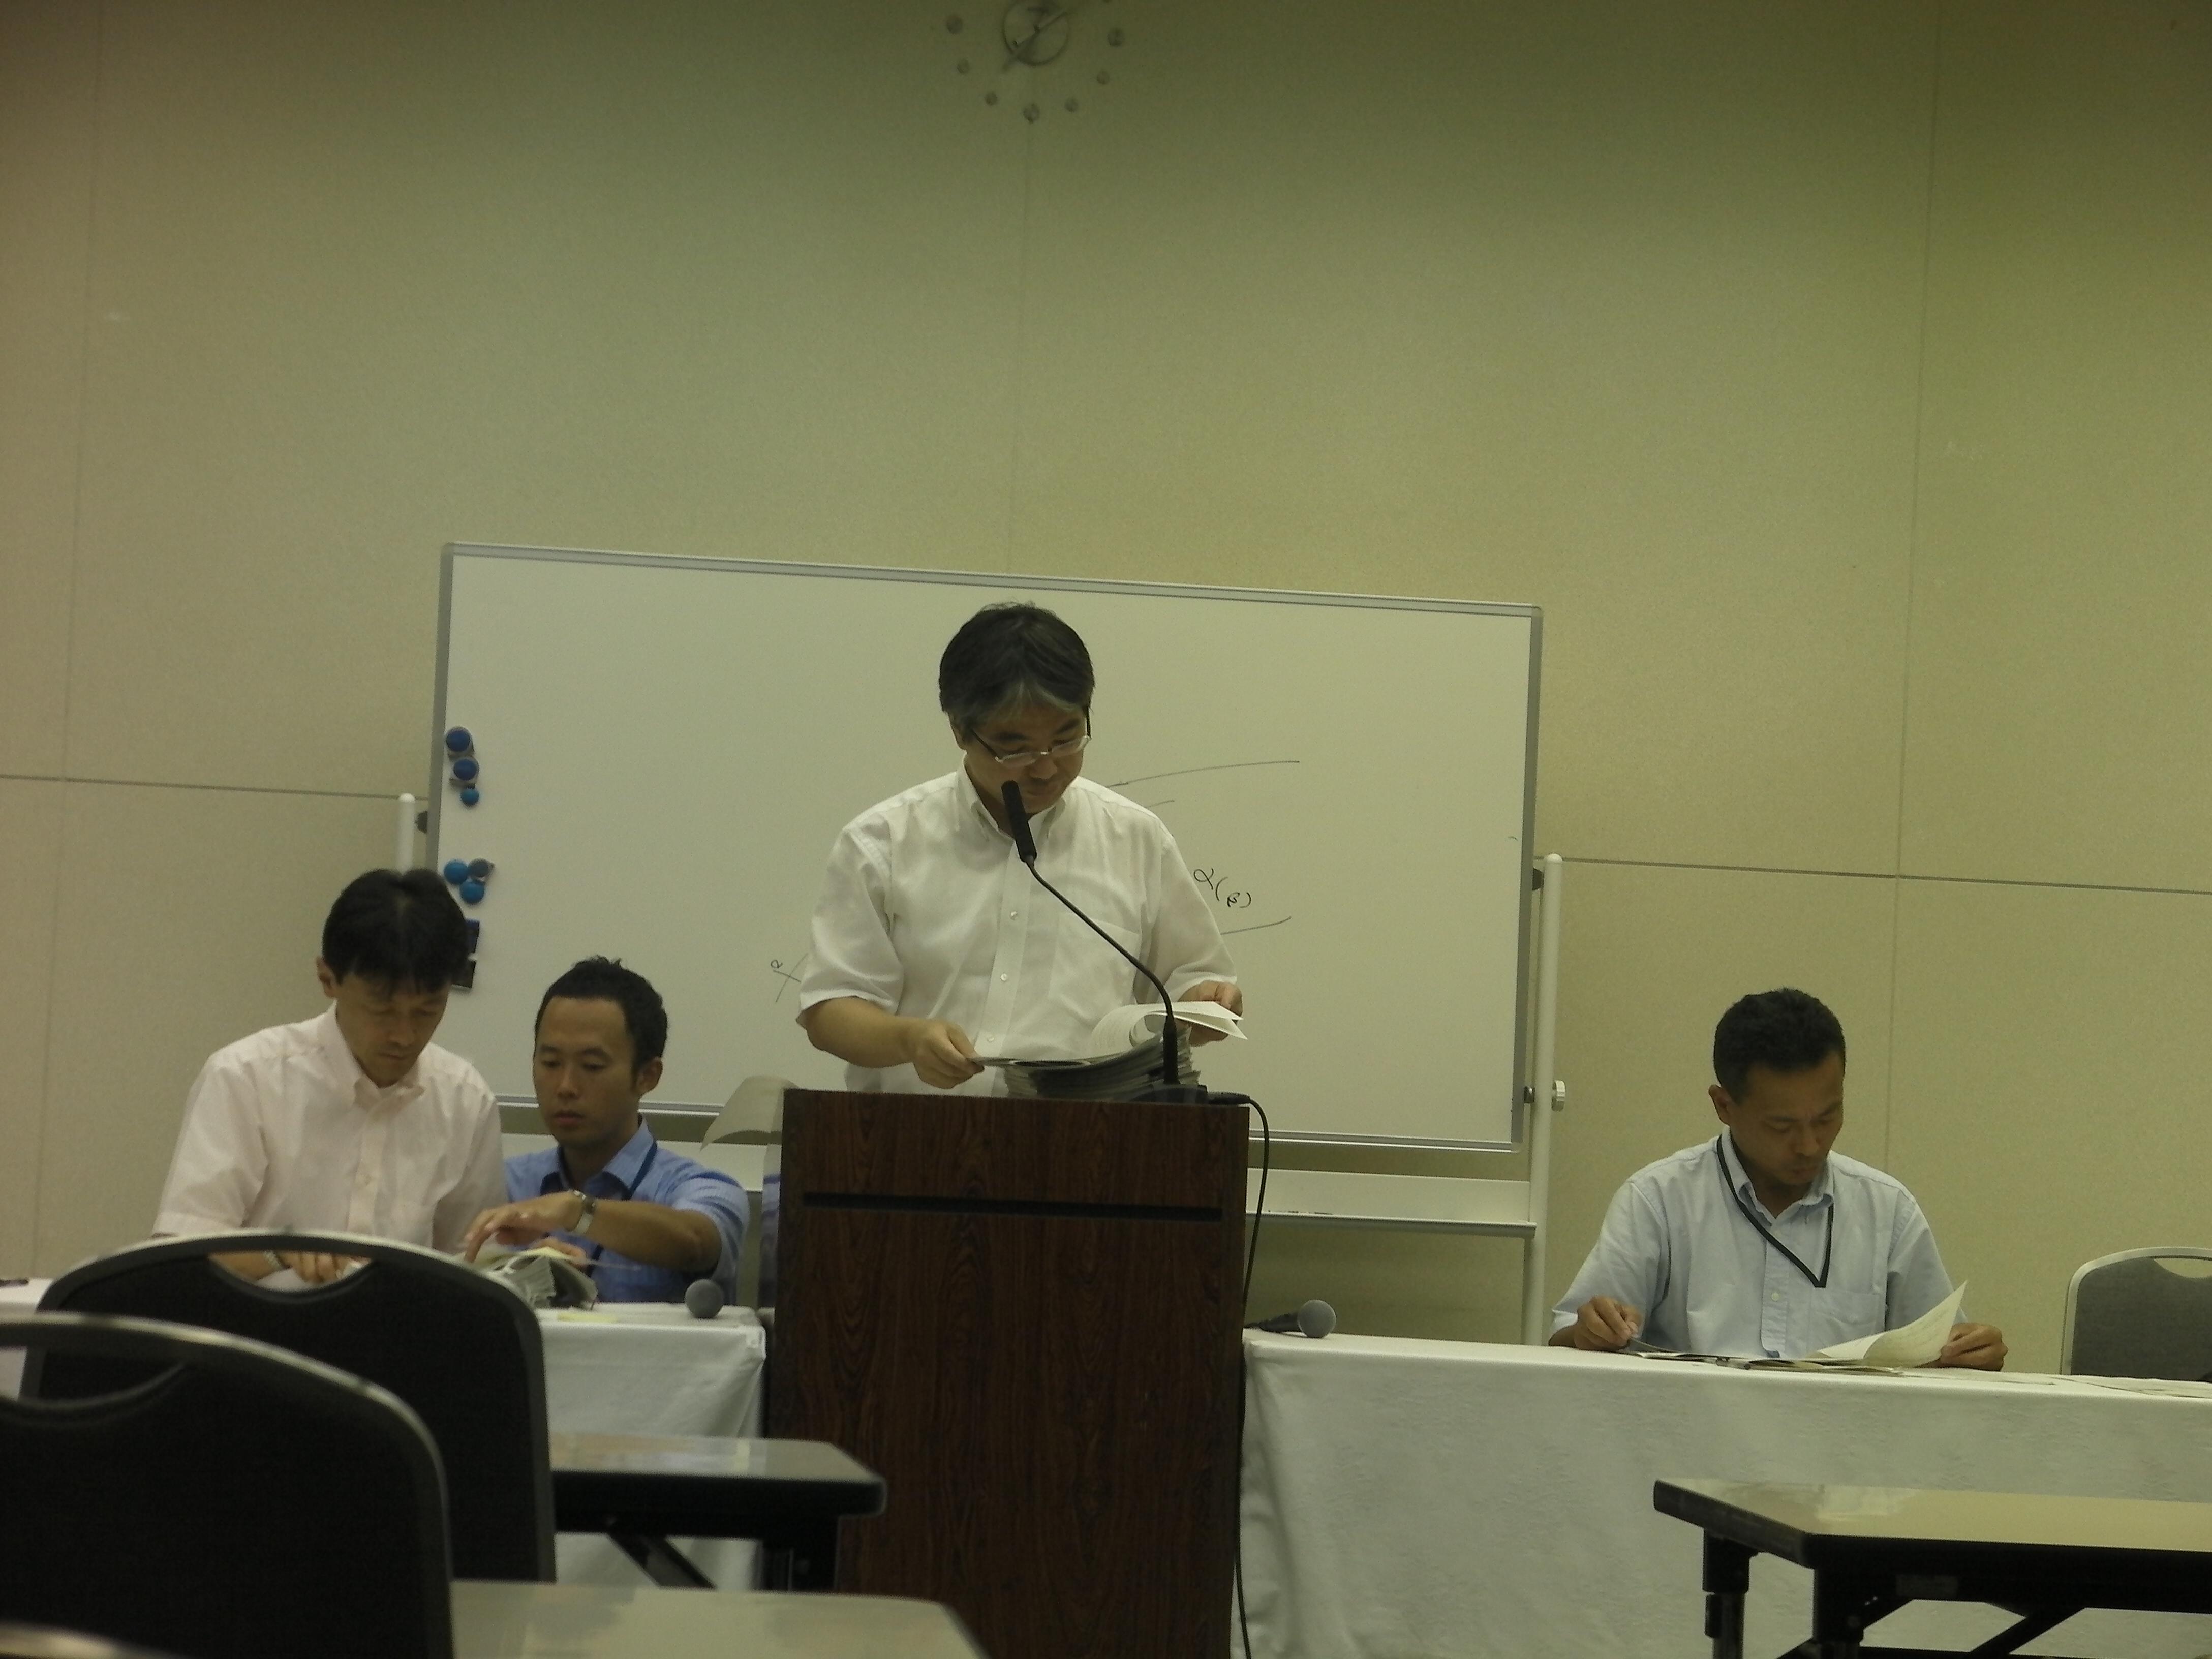 http://daily.magazine9.jp/m9/oshidori/SANY0532.JPG